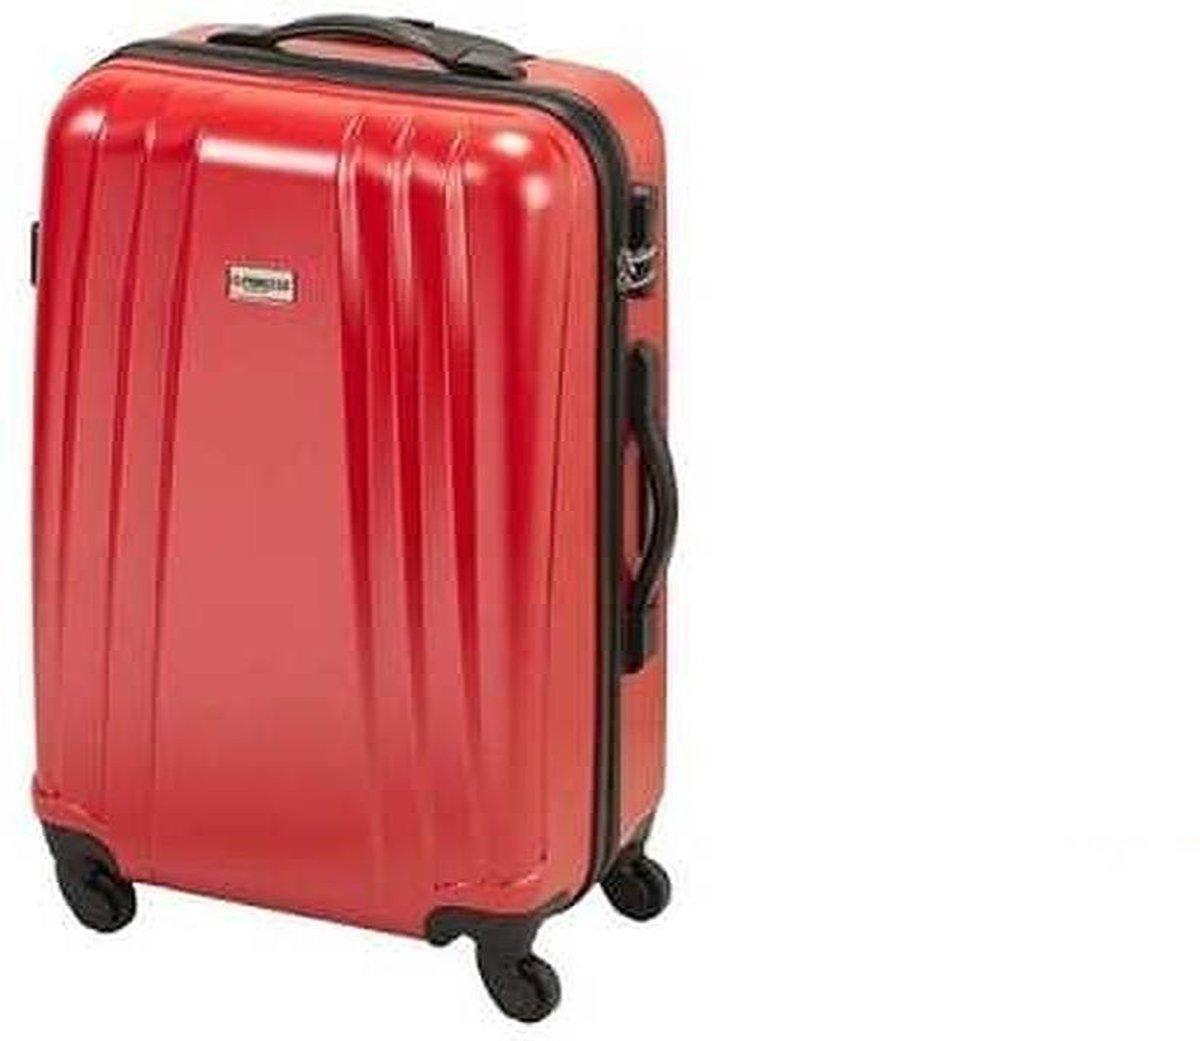 Phoenix - Princess Traveller reiskoffer, 61 liter kopen